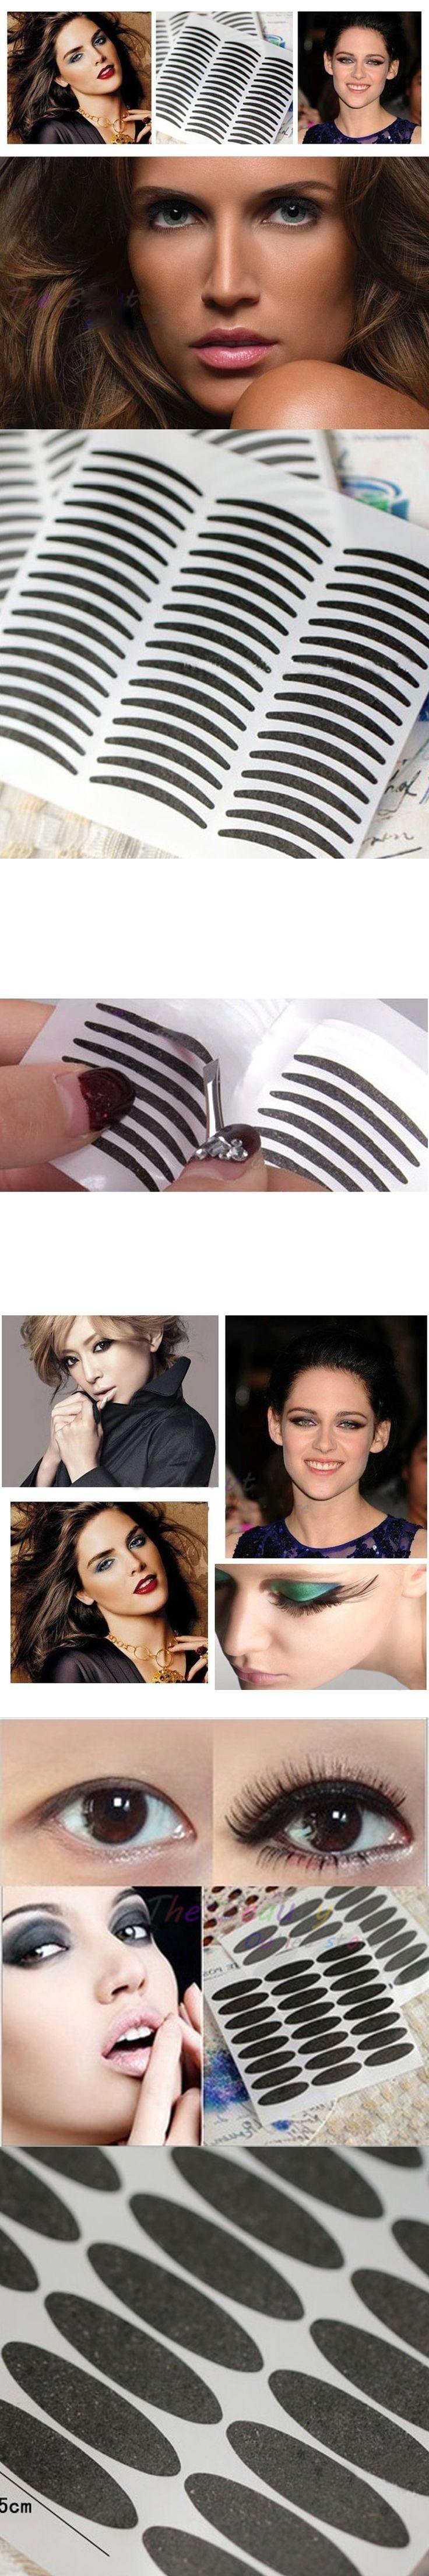 72pair Black Cat-eye Eye liner Stripe Make Up Eye Sticker Double Eyelid Transfer Tape Eye Tattoo Eyeliner Waterproof Maquillage